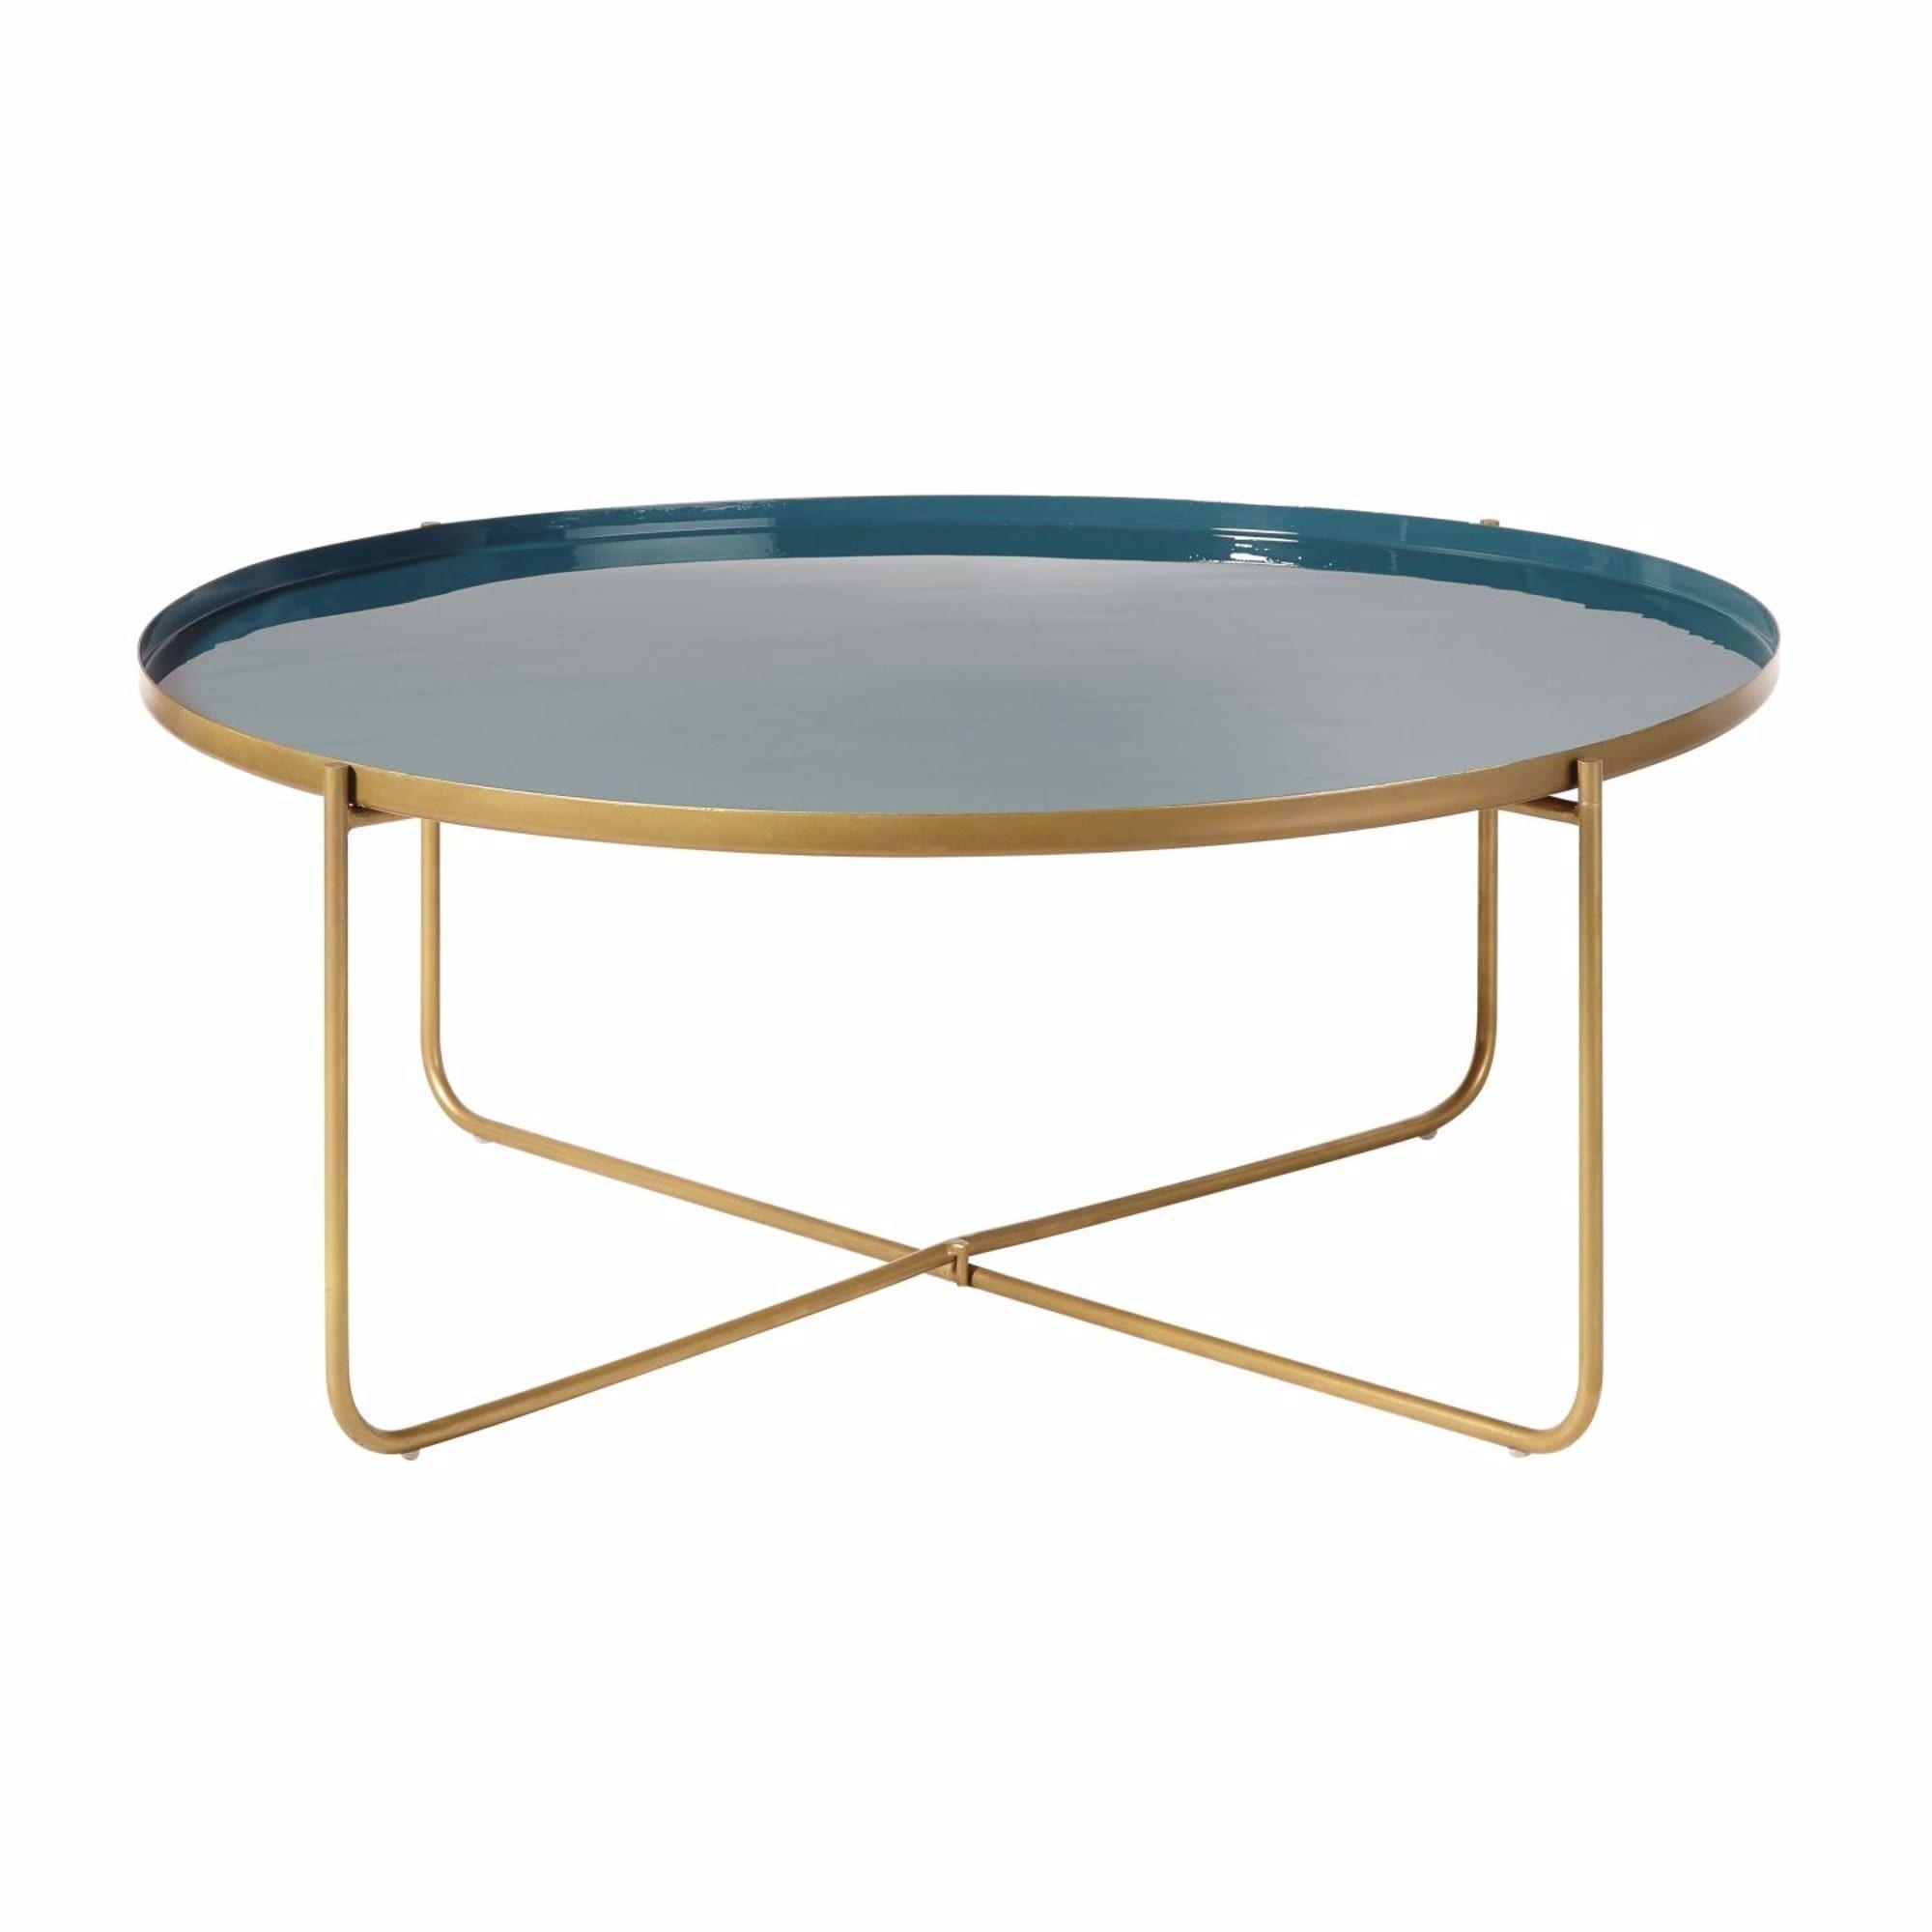 Table Basse Ronde En Metal Bleu Canard Et Dore Galet Maisons Du Monde In 2020 Coffee Table Metal Coffee Table Round Metal Coffee Table